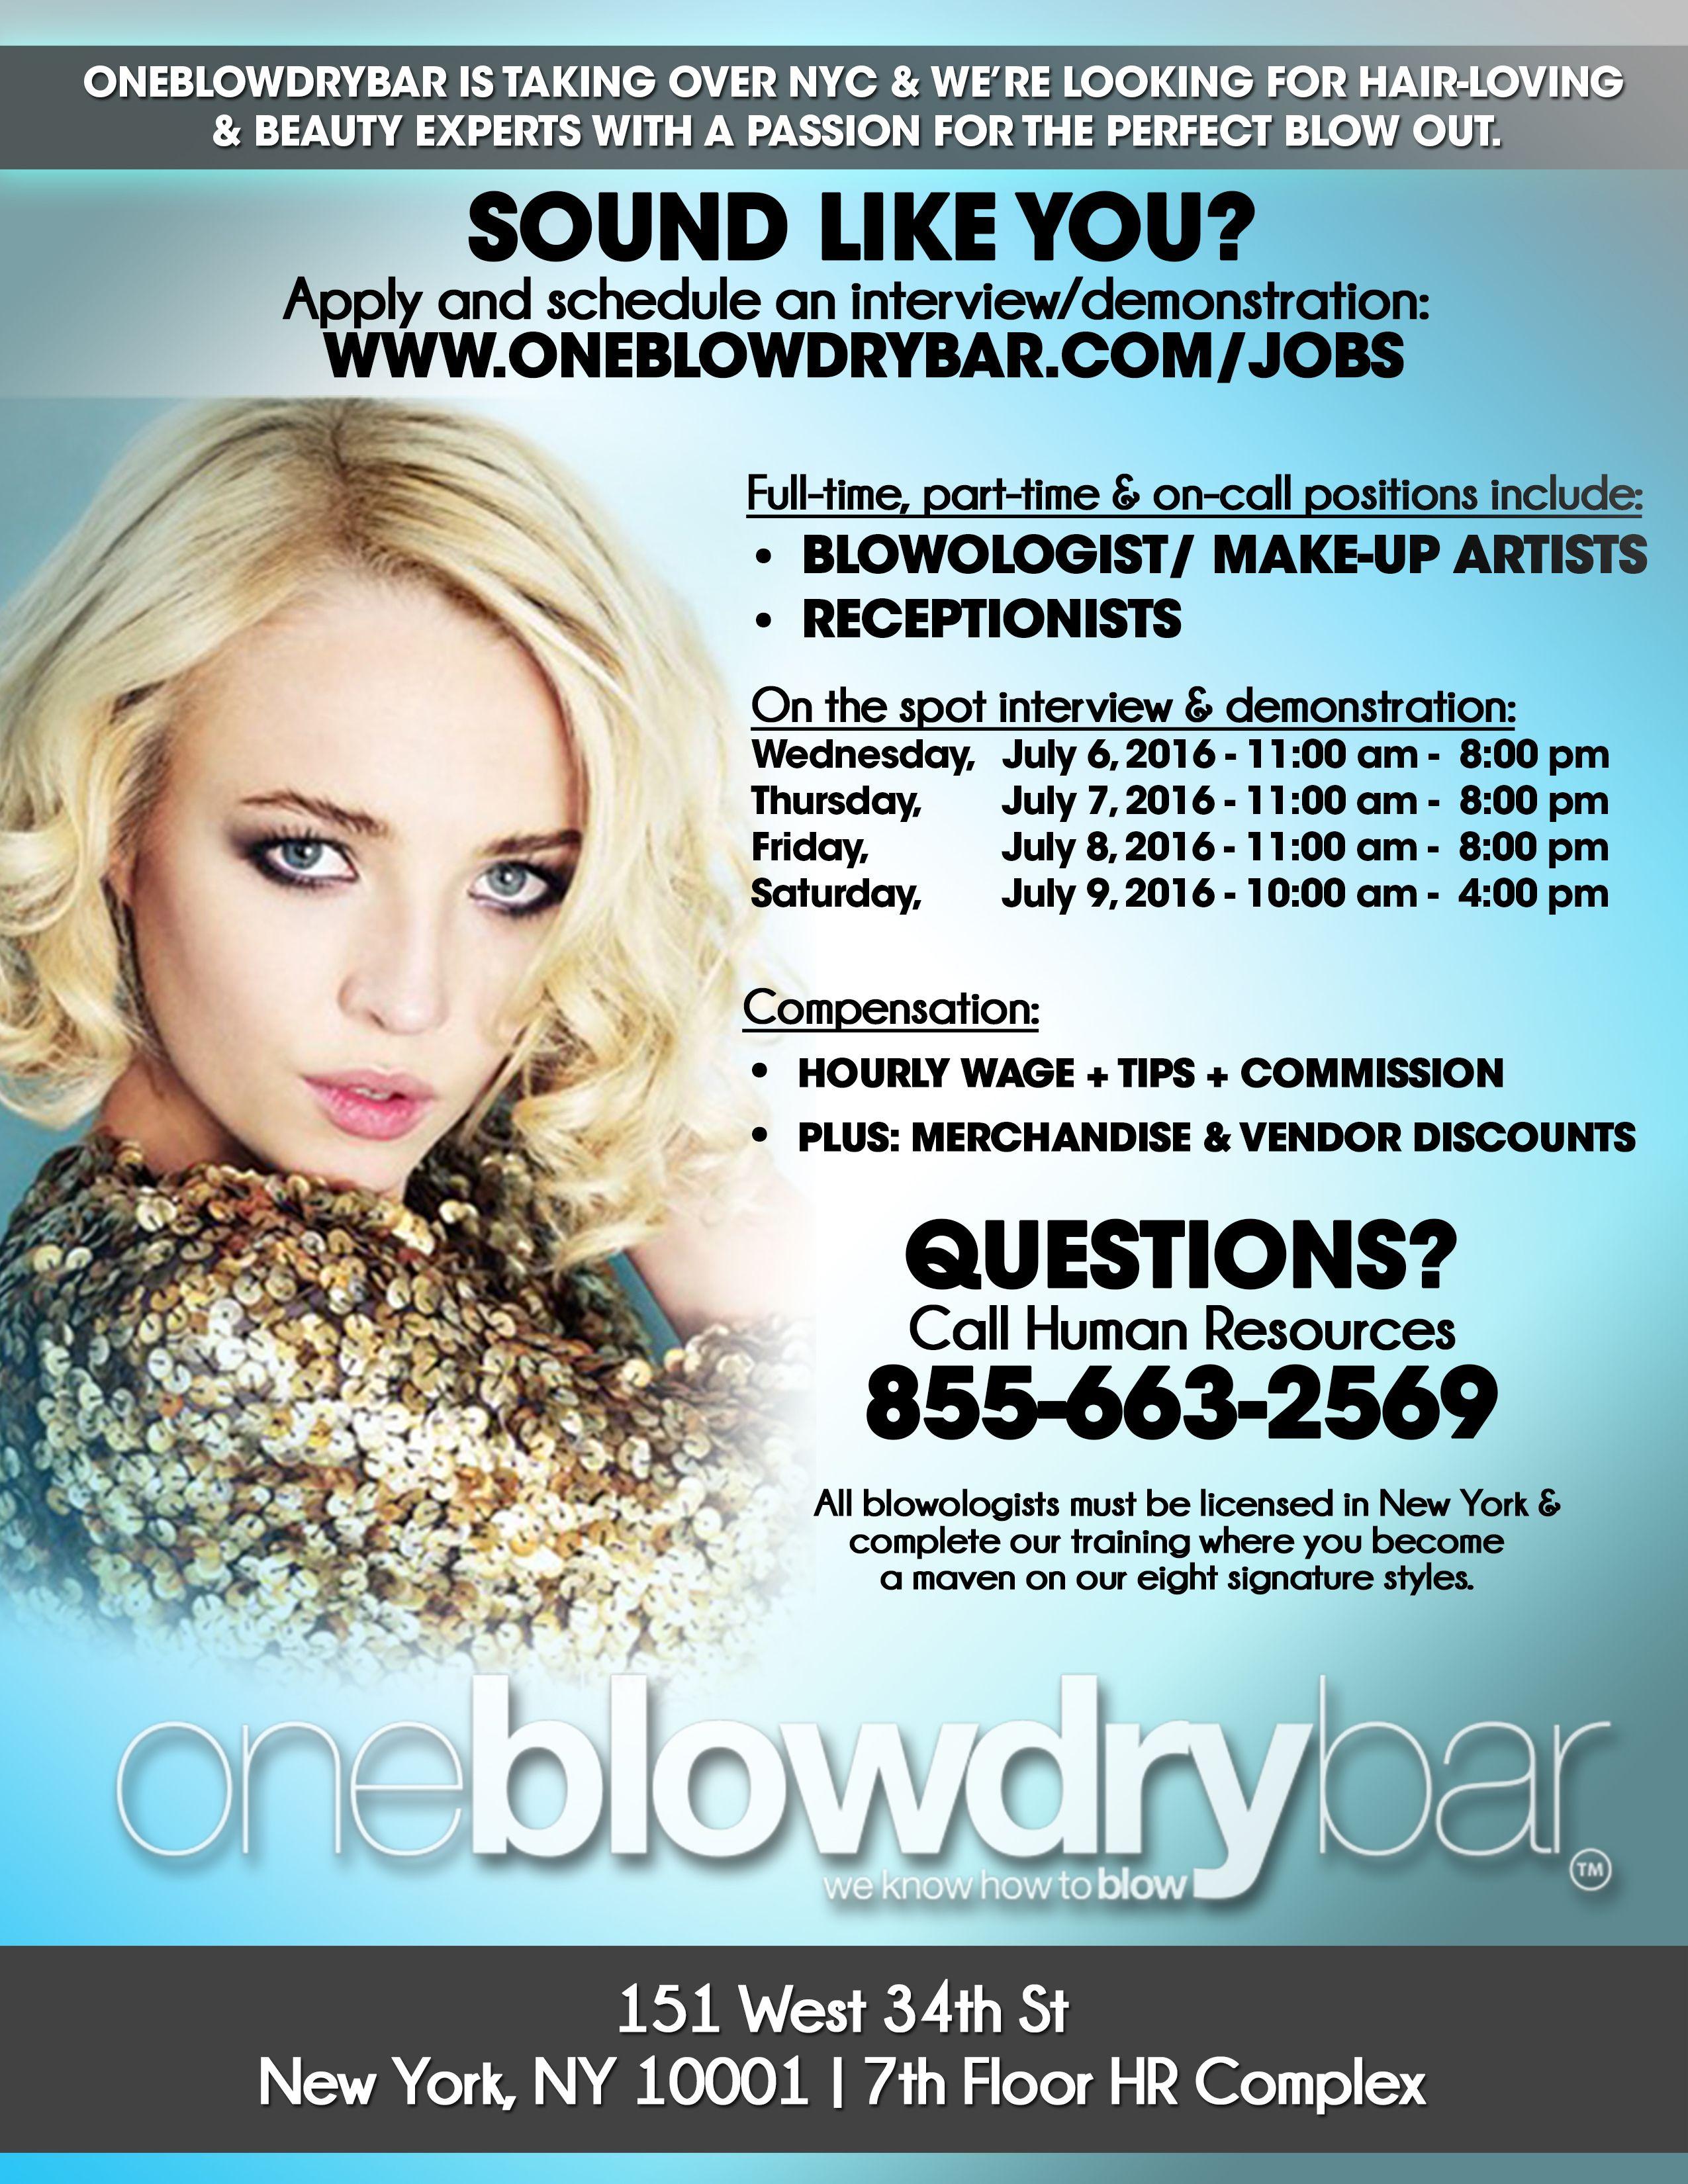 Hairstylist Jobs Oneblowdrybar Blow Dry Bar And Blowout Hairstyling Salons Blow Dry Bar Blow Dry Dry Bar Blowout